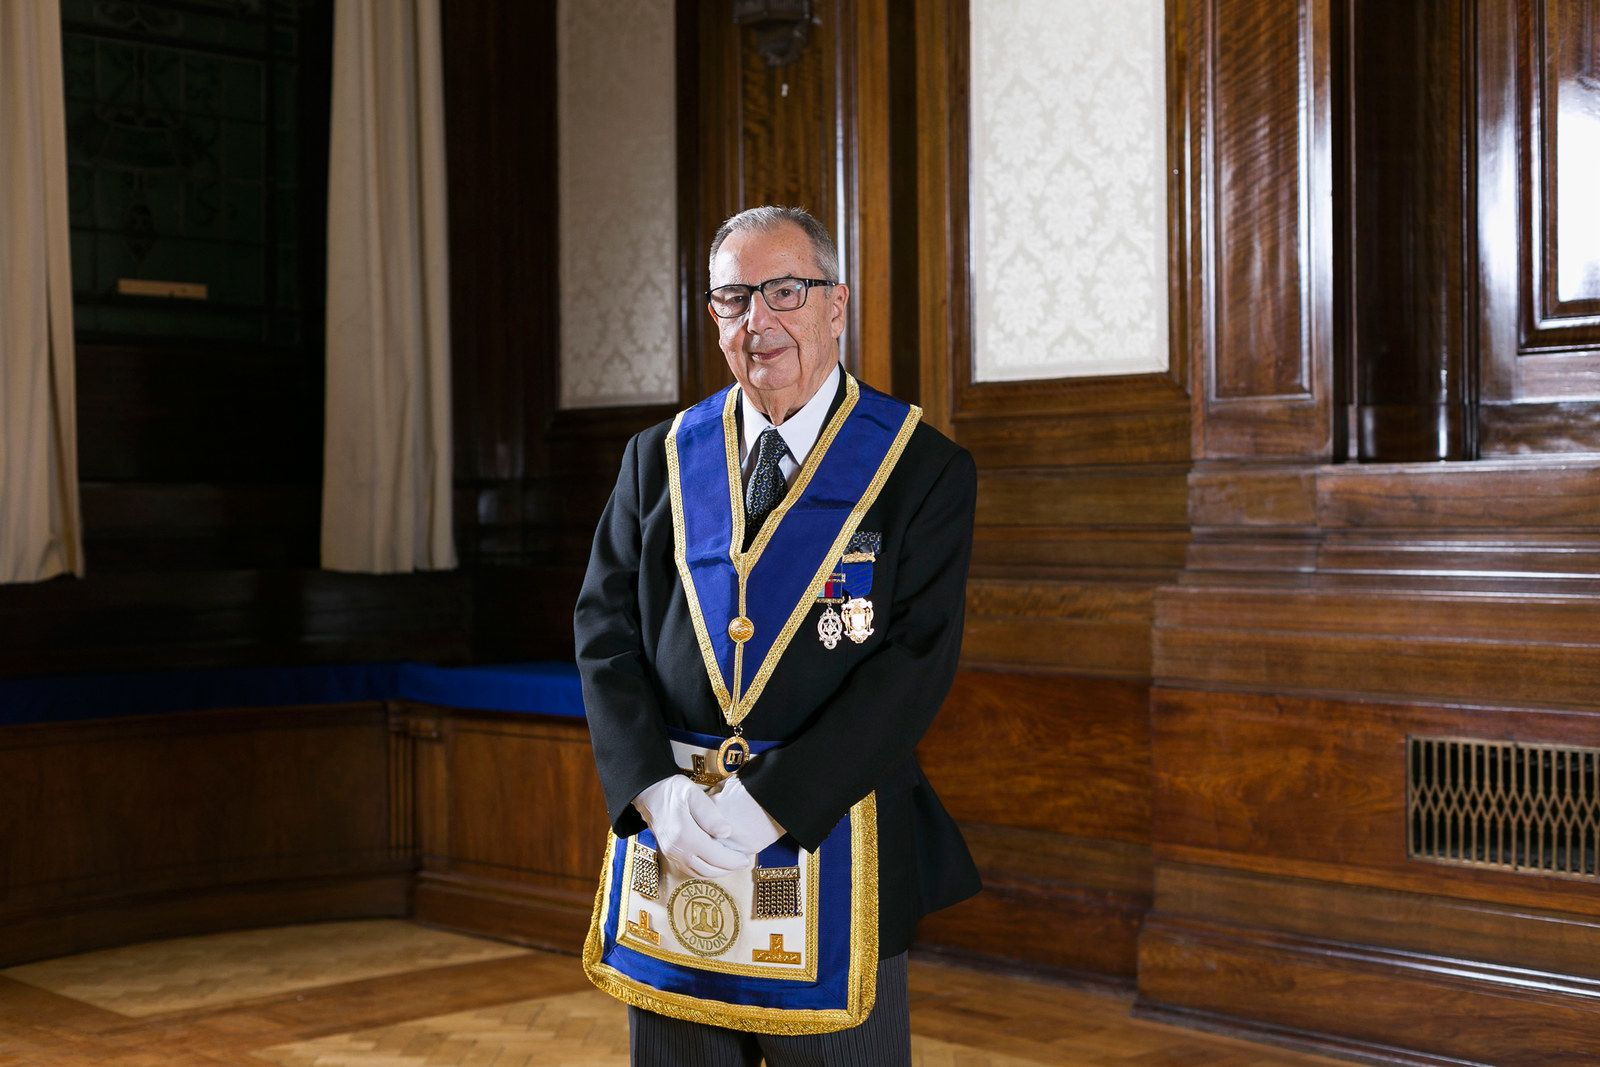 23 Freemasons Offer A Look Inside The Secretive Society